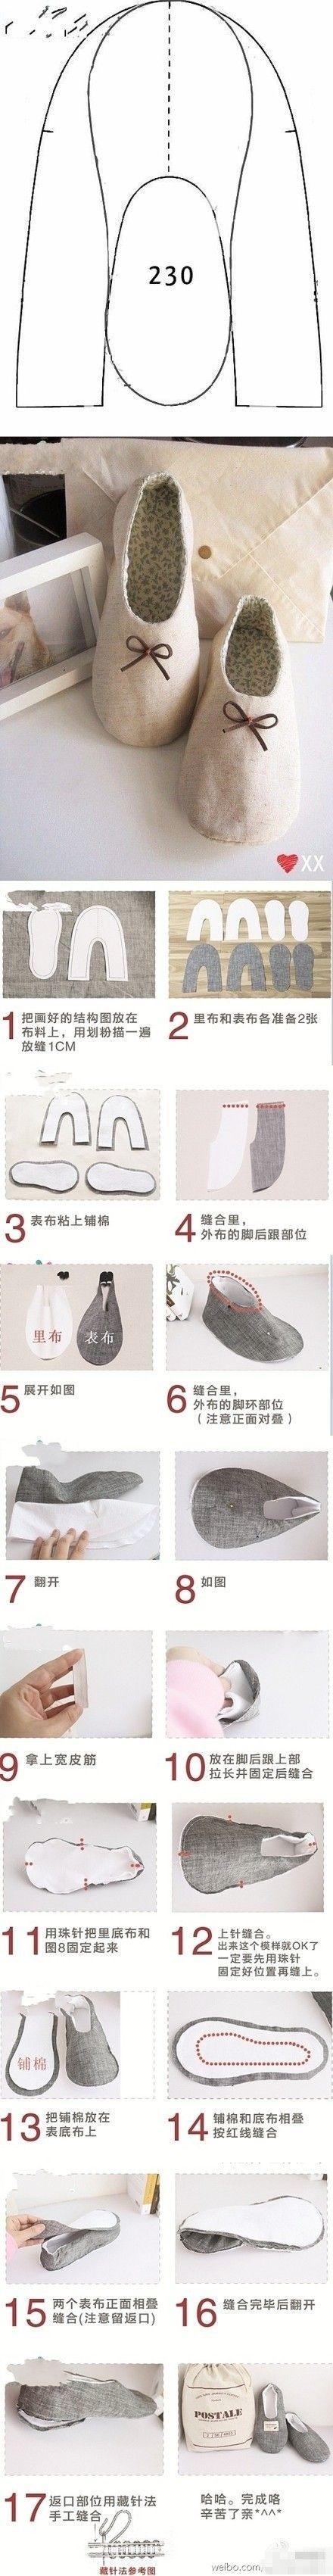 slippers creaciones pinterest n hen schuhe und schuhe h keln. Black Bedroom Furniture Sets. Home Design Ideas